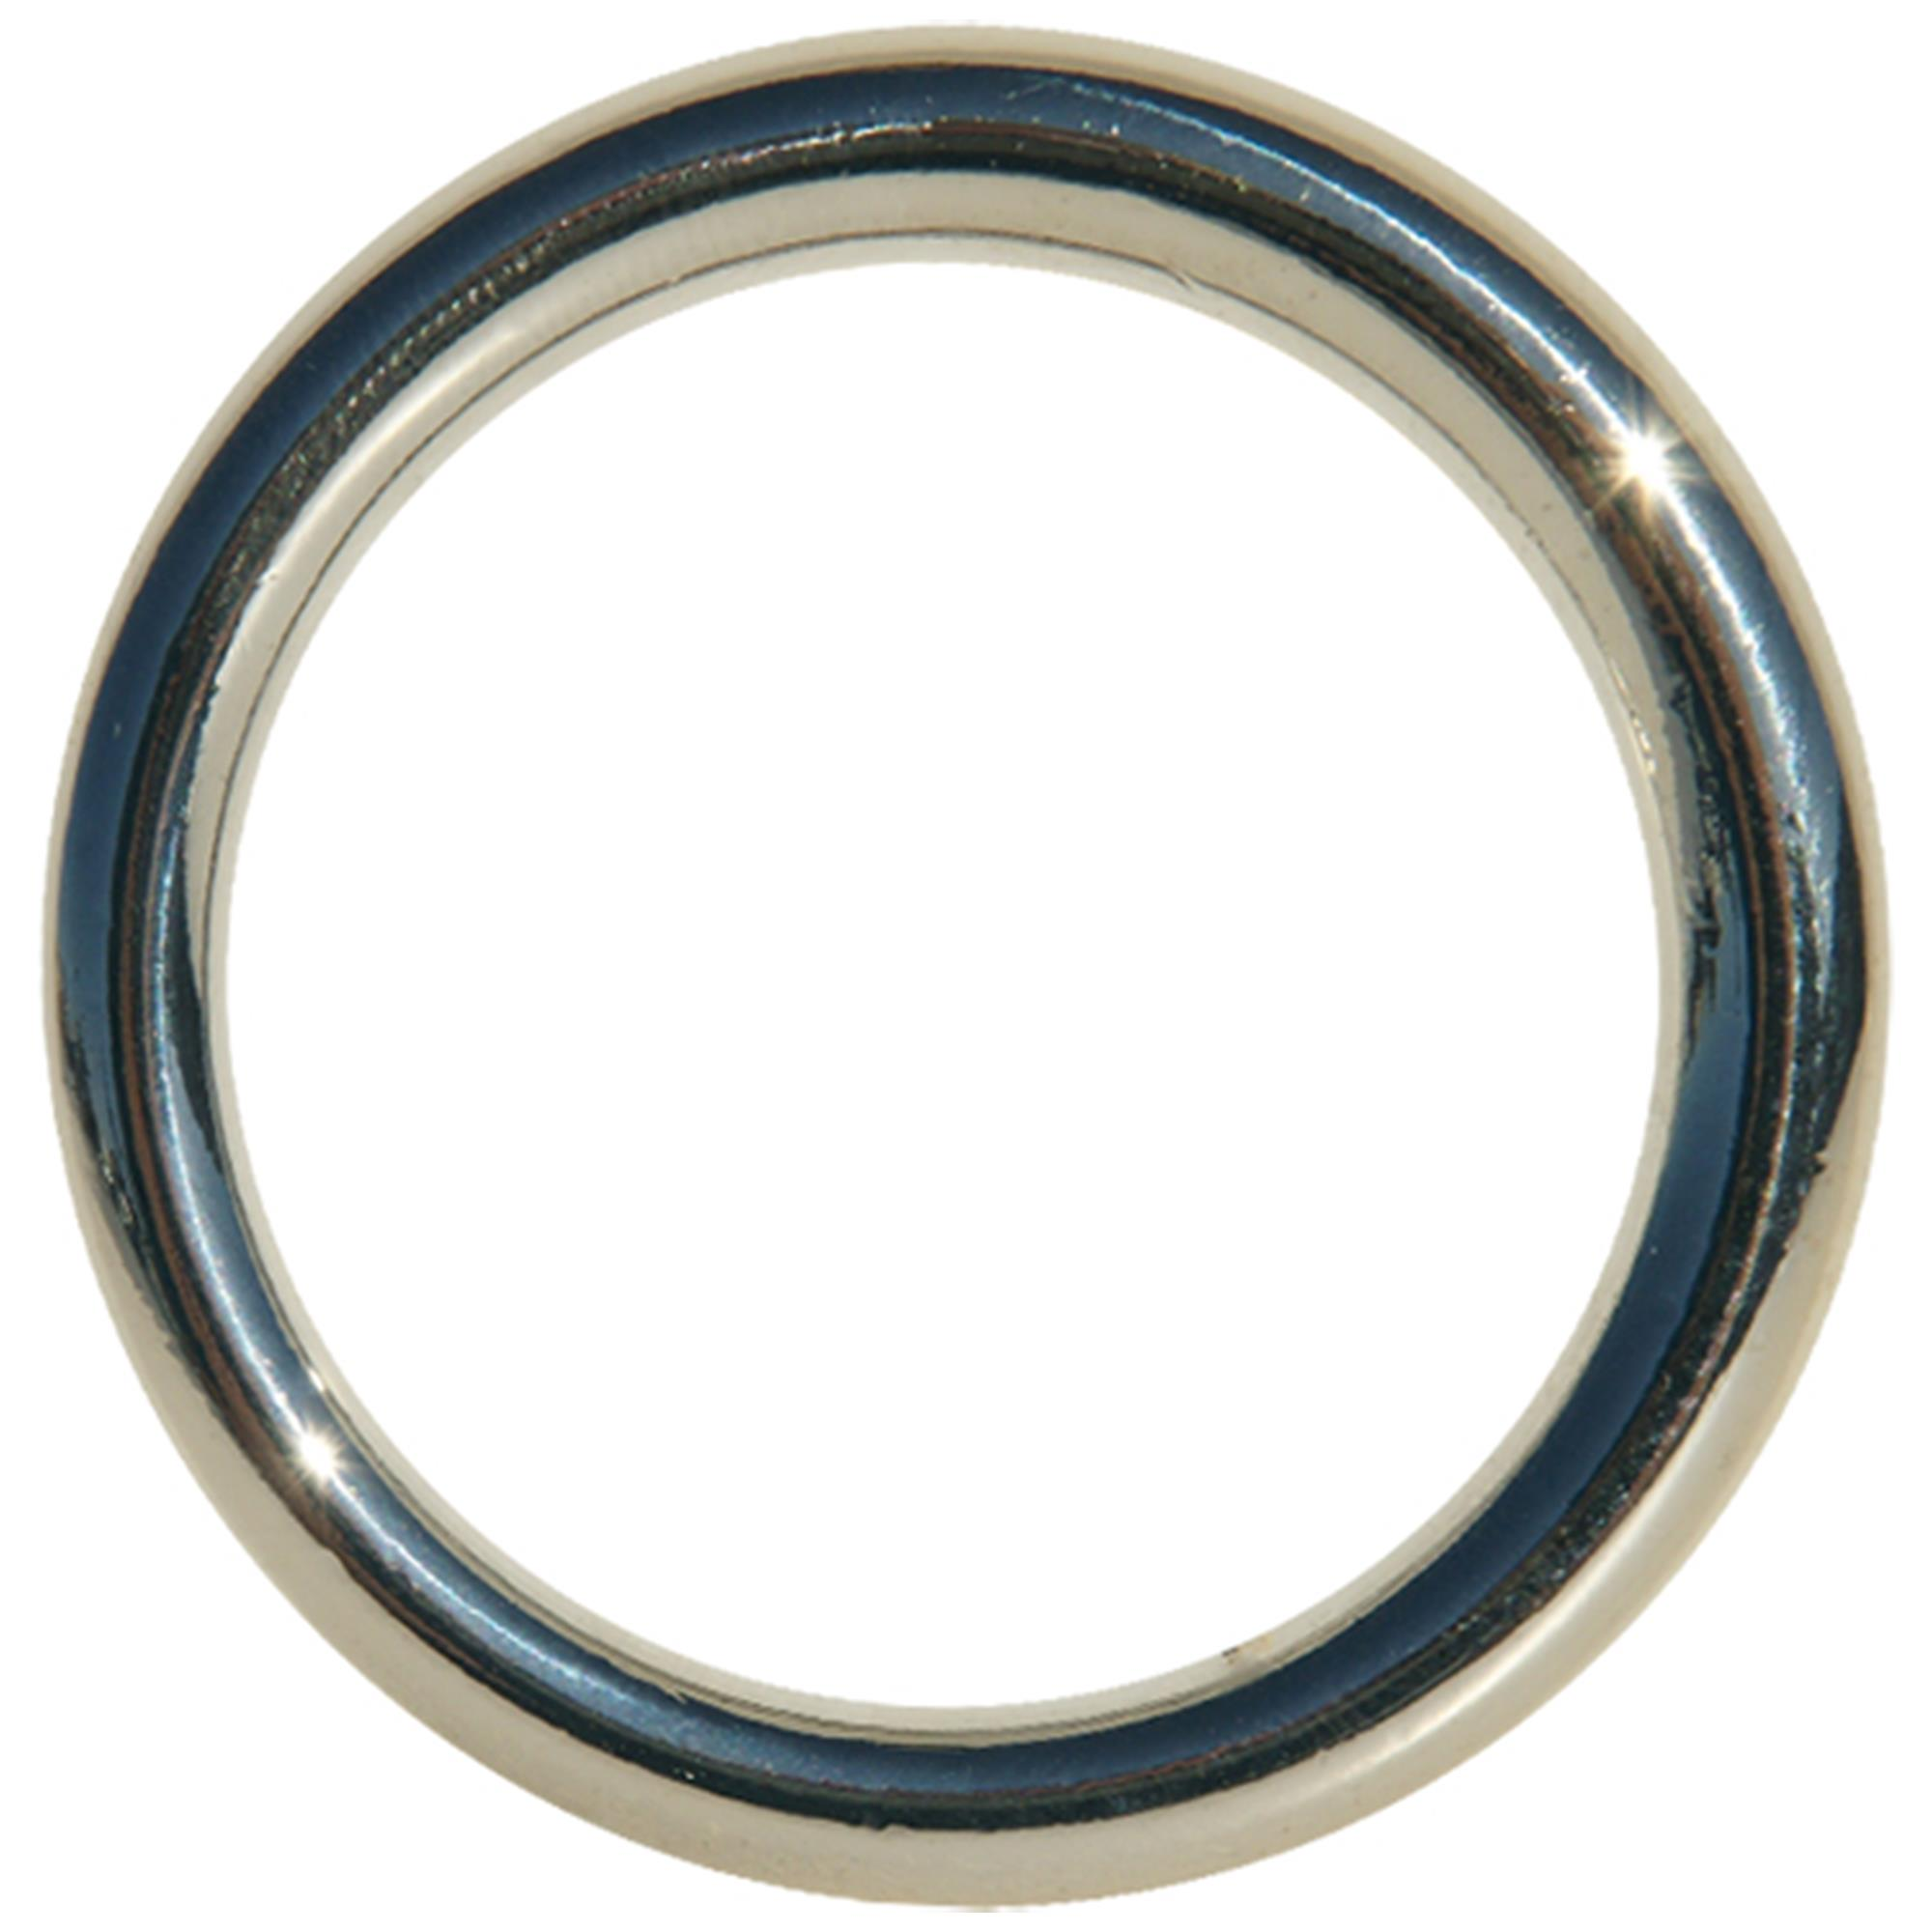 Edge Seamless Metal Ring 4,5 cm